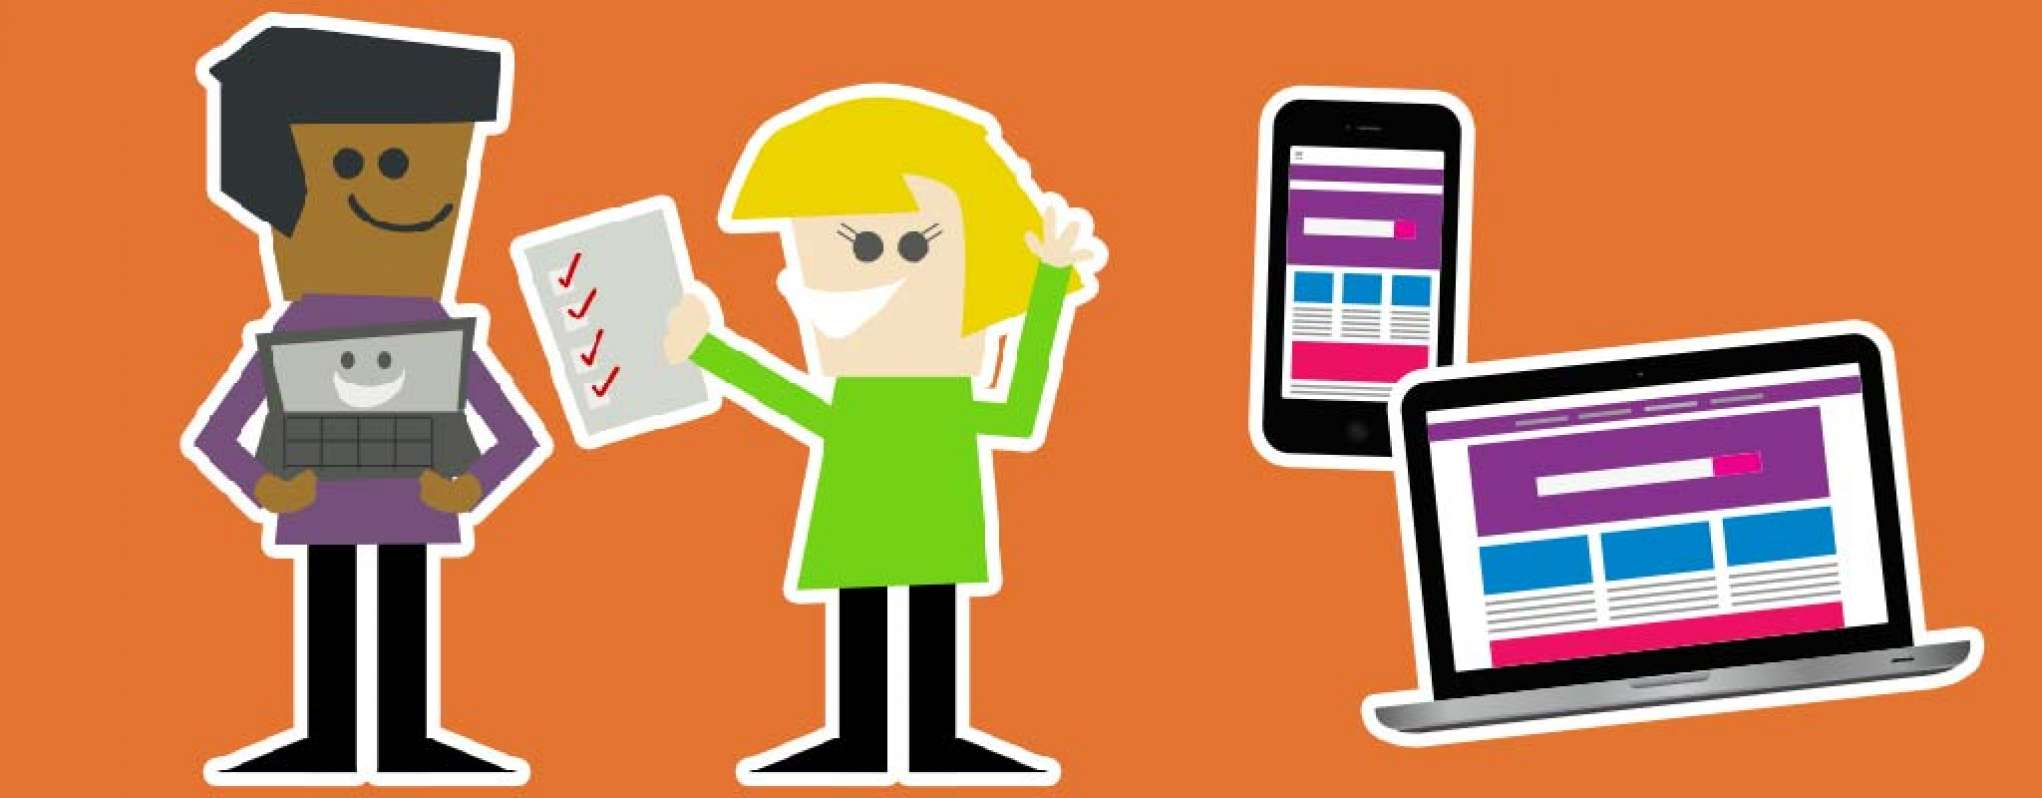 Software Entwicklung, agil, coding, development, edubreak,